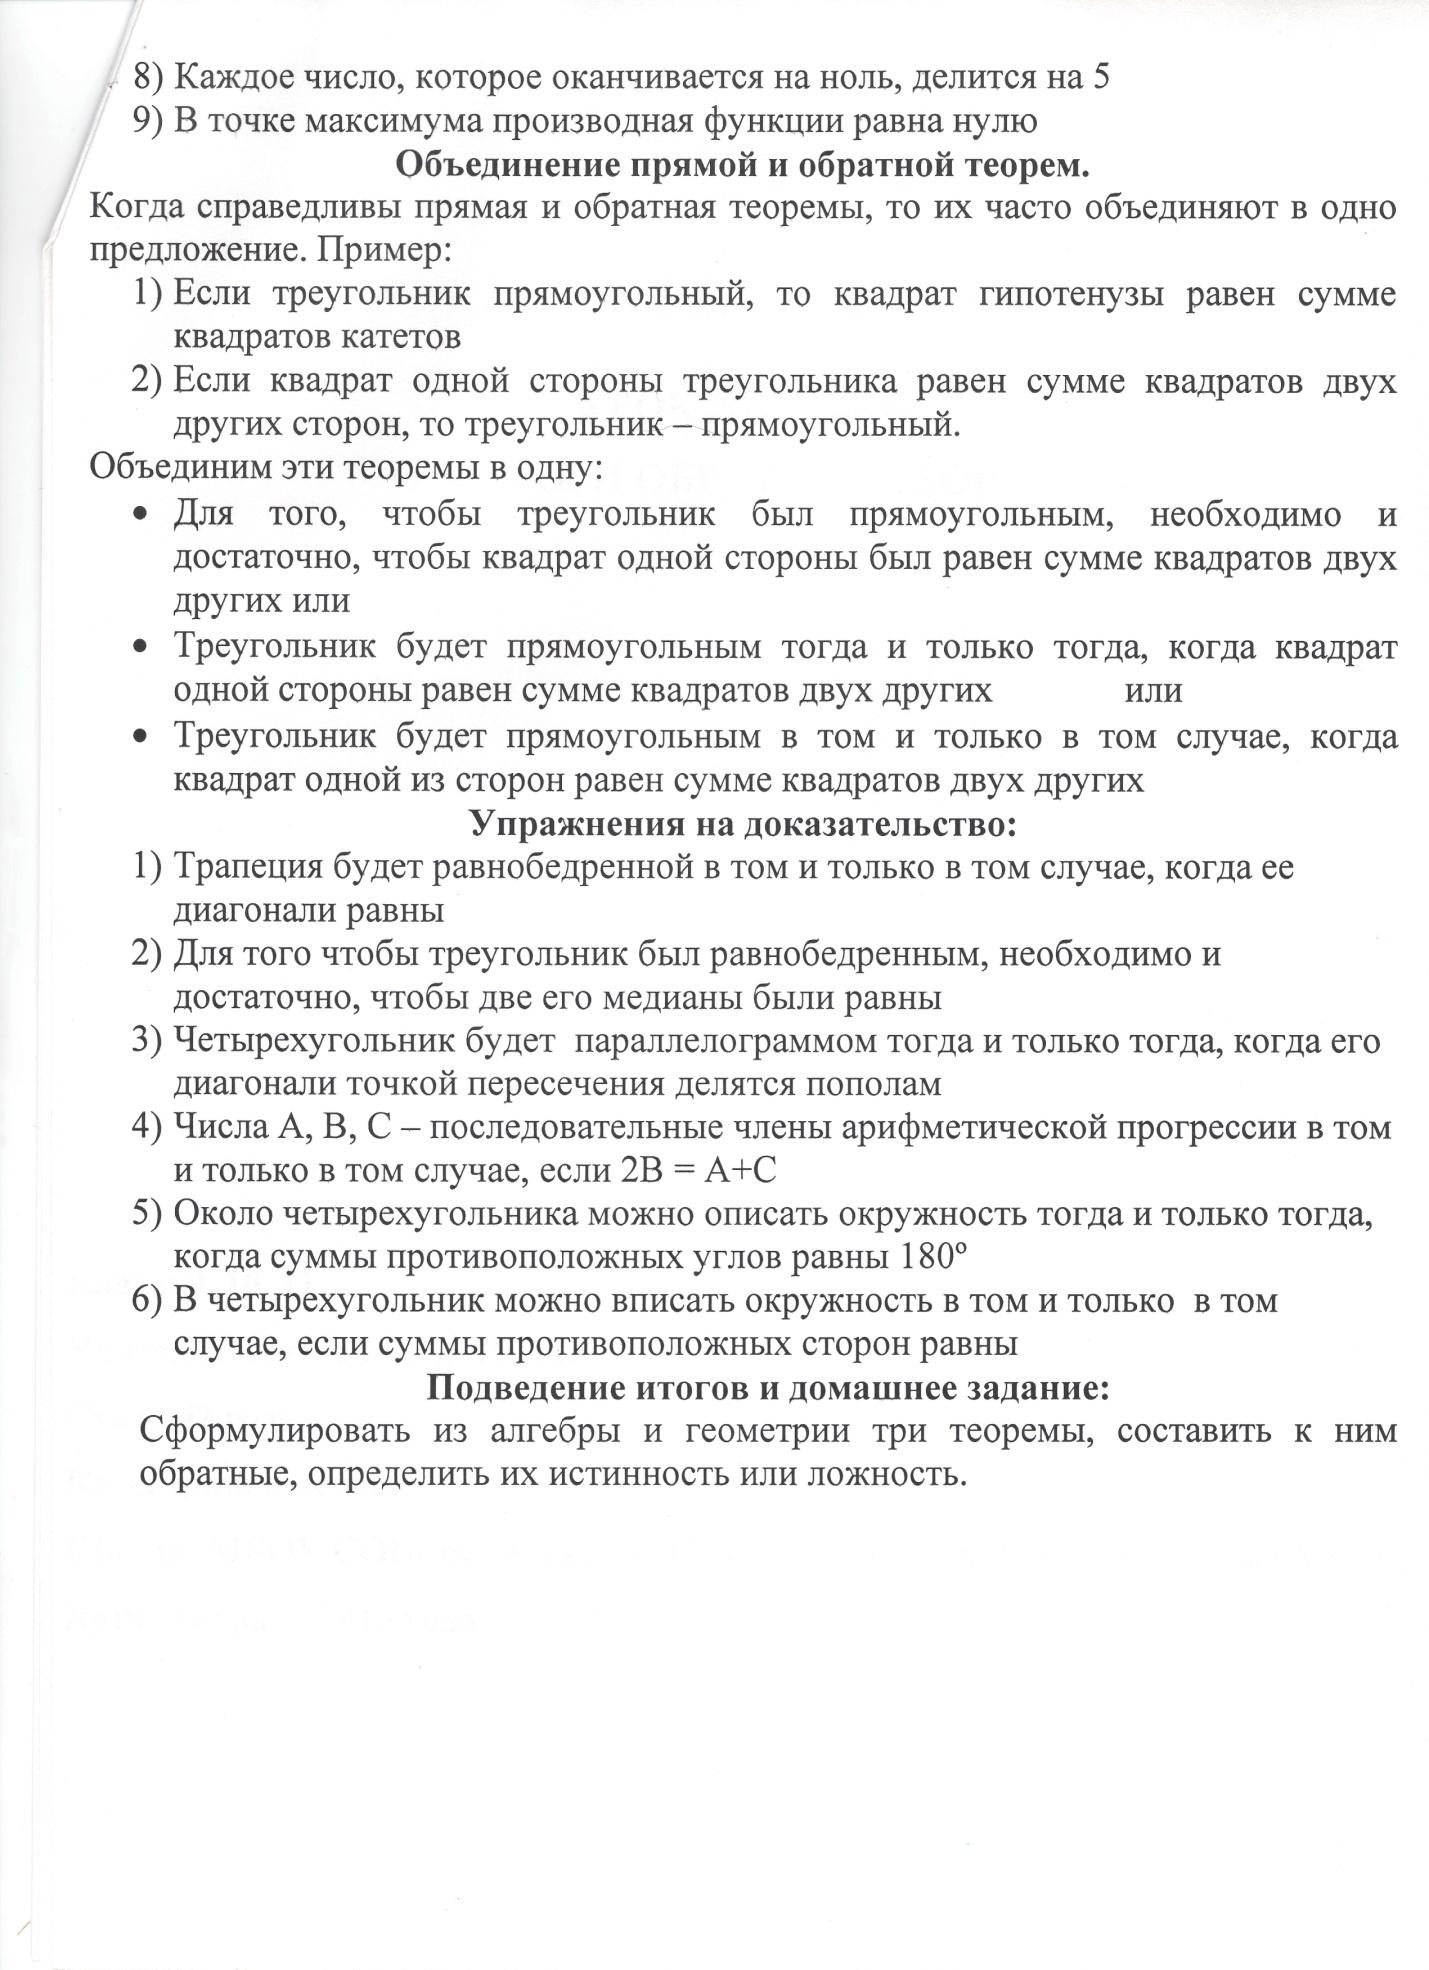 C:\Users\Оганина\Desktop\урок5.jpg